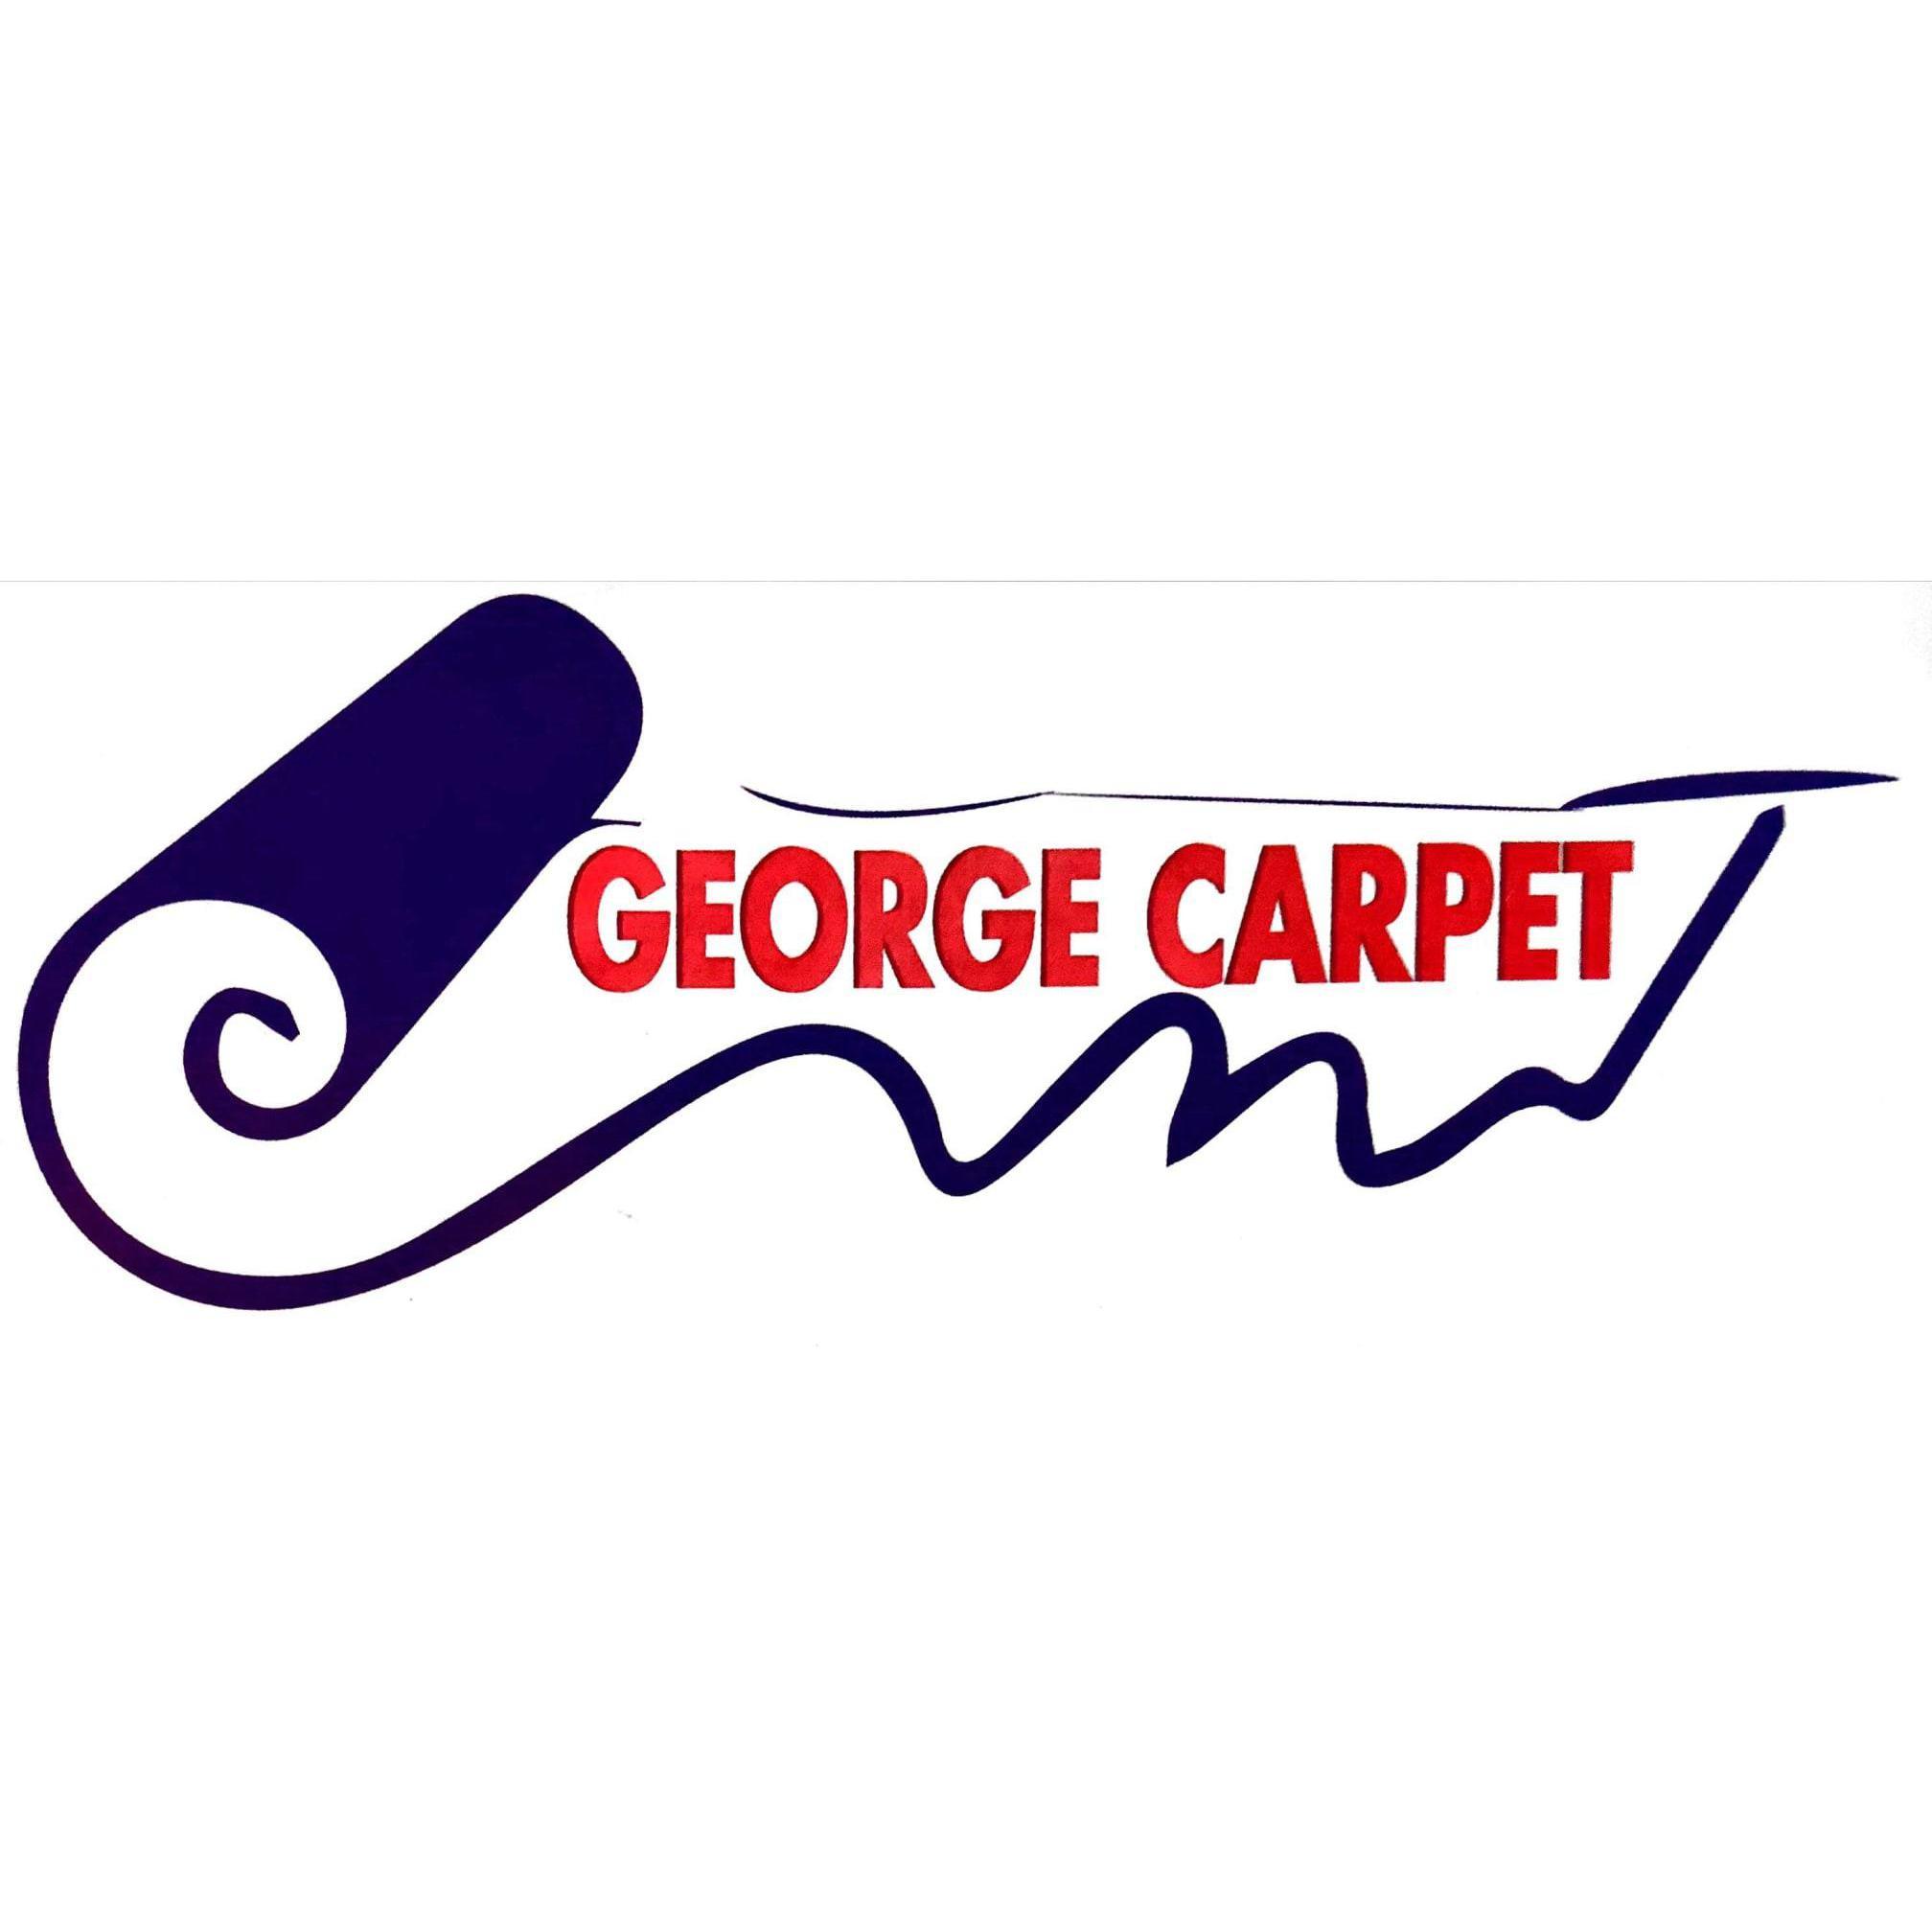 George Carpet & Flooring Ltd - London, London NW2 5JG - 020 3092 4844 | ShowMeLocal.com